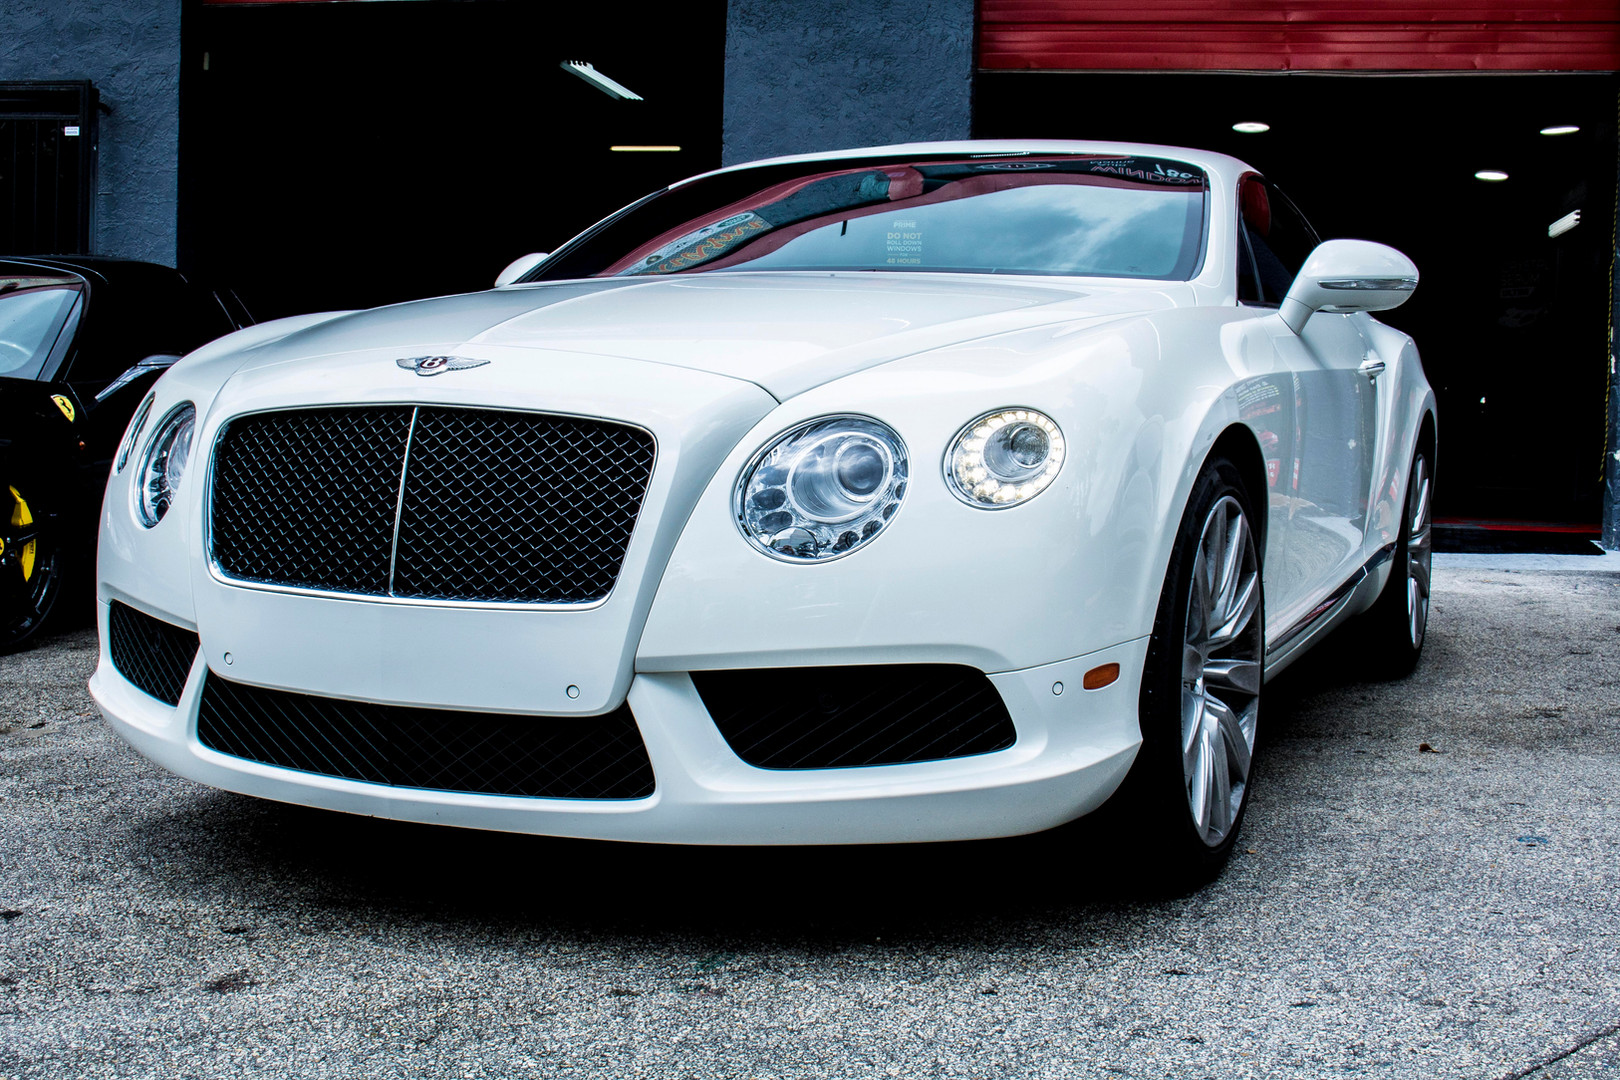 White Bentley Photographed by Jorge Alberto Perez  Miami Car photographer